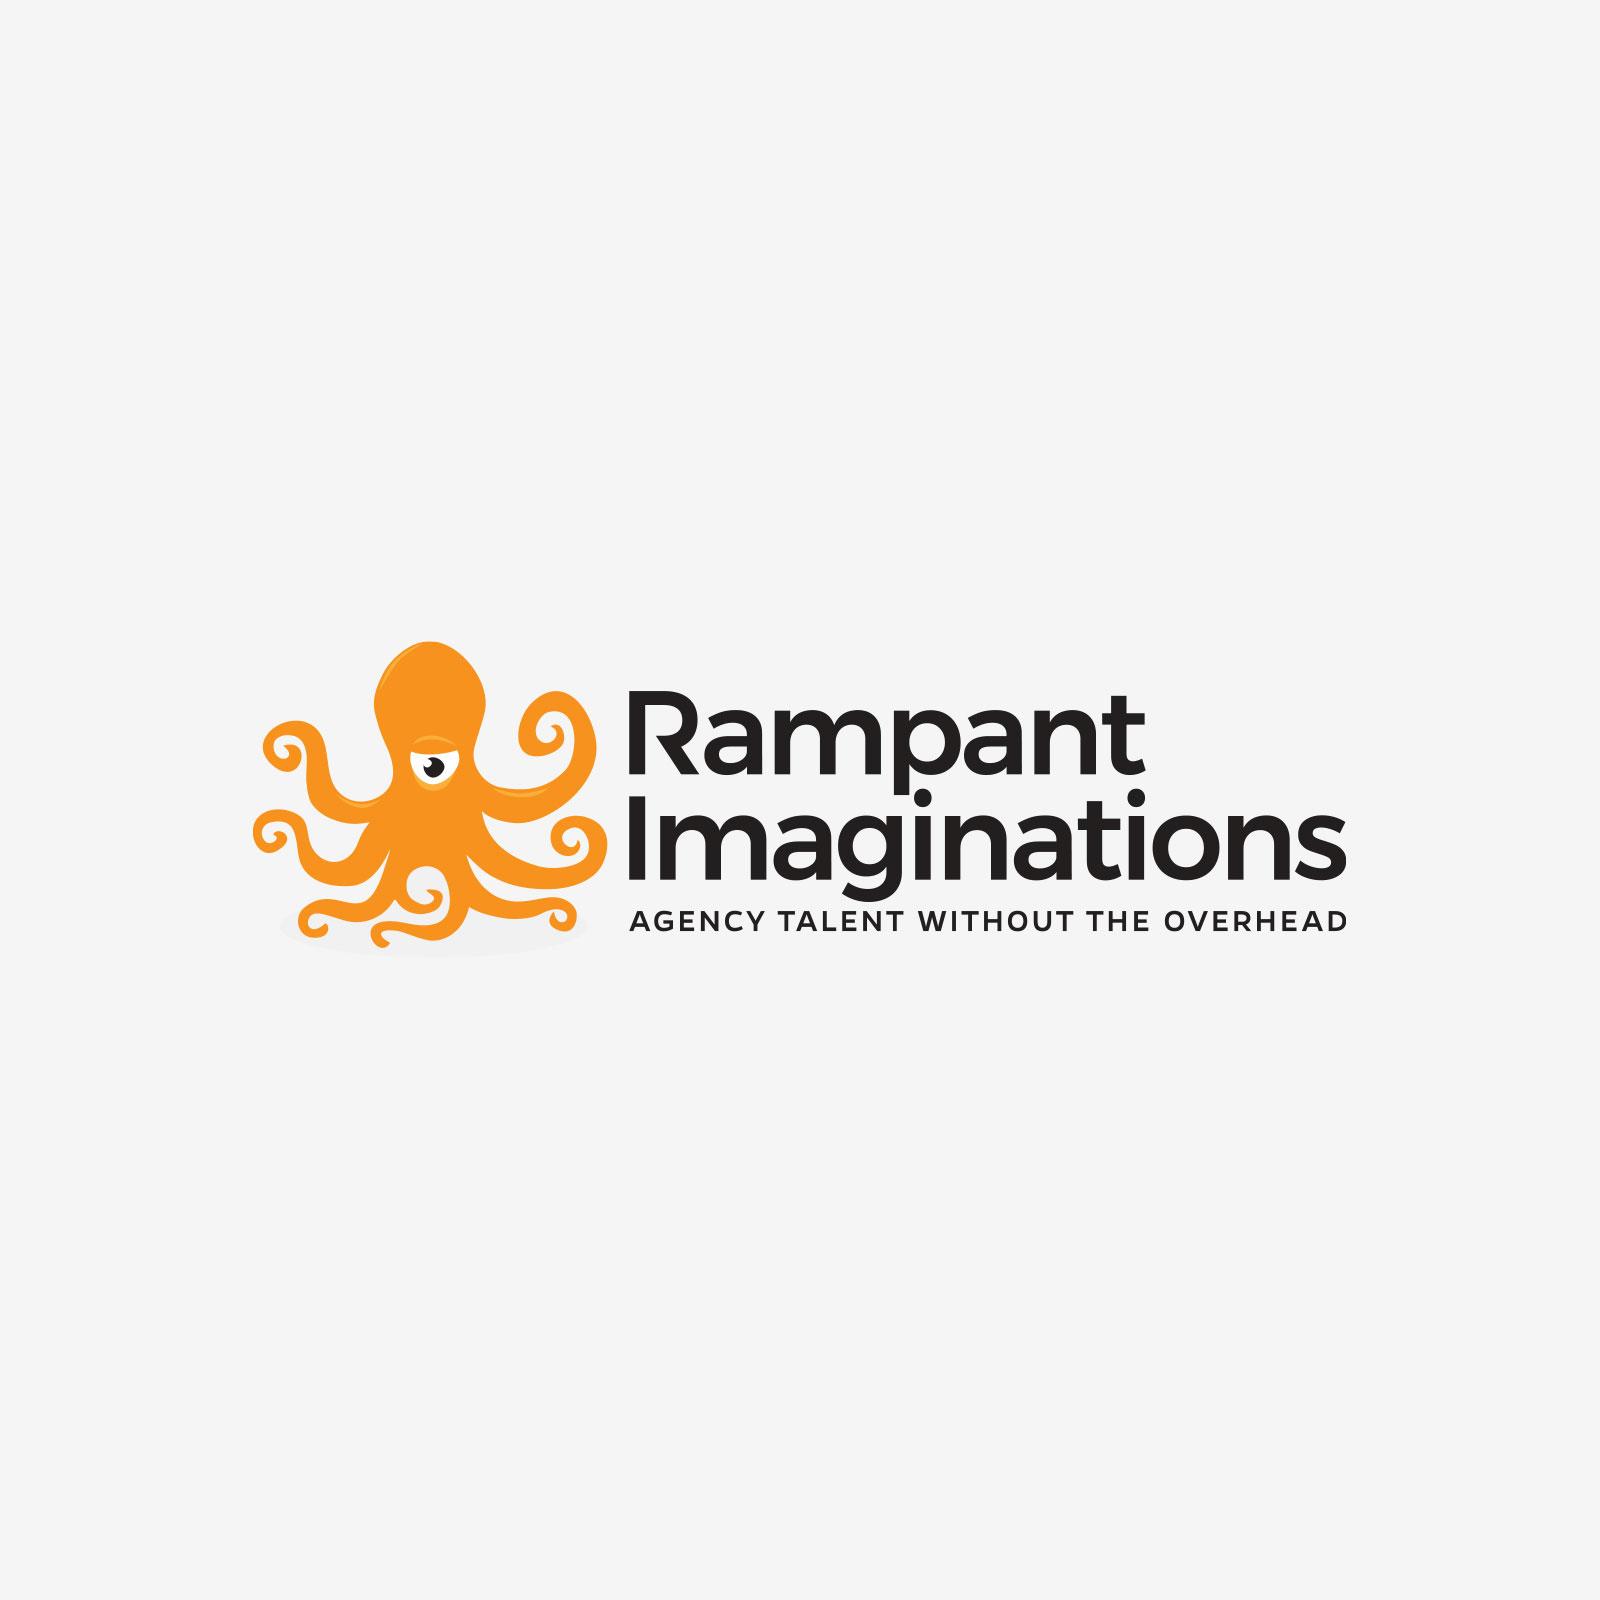 Logo design for Rampant Imaginations